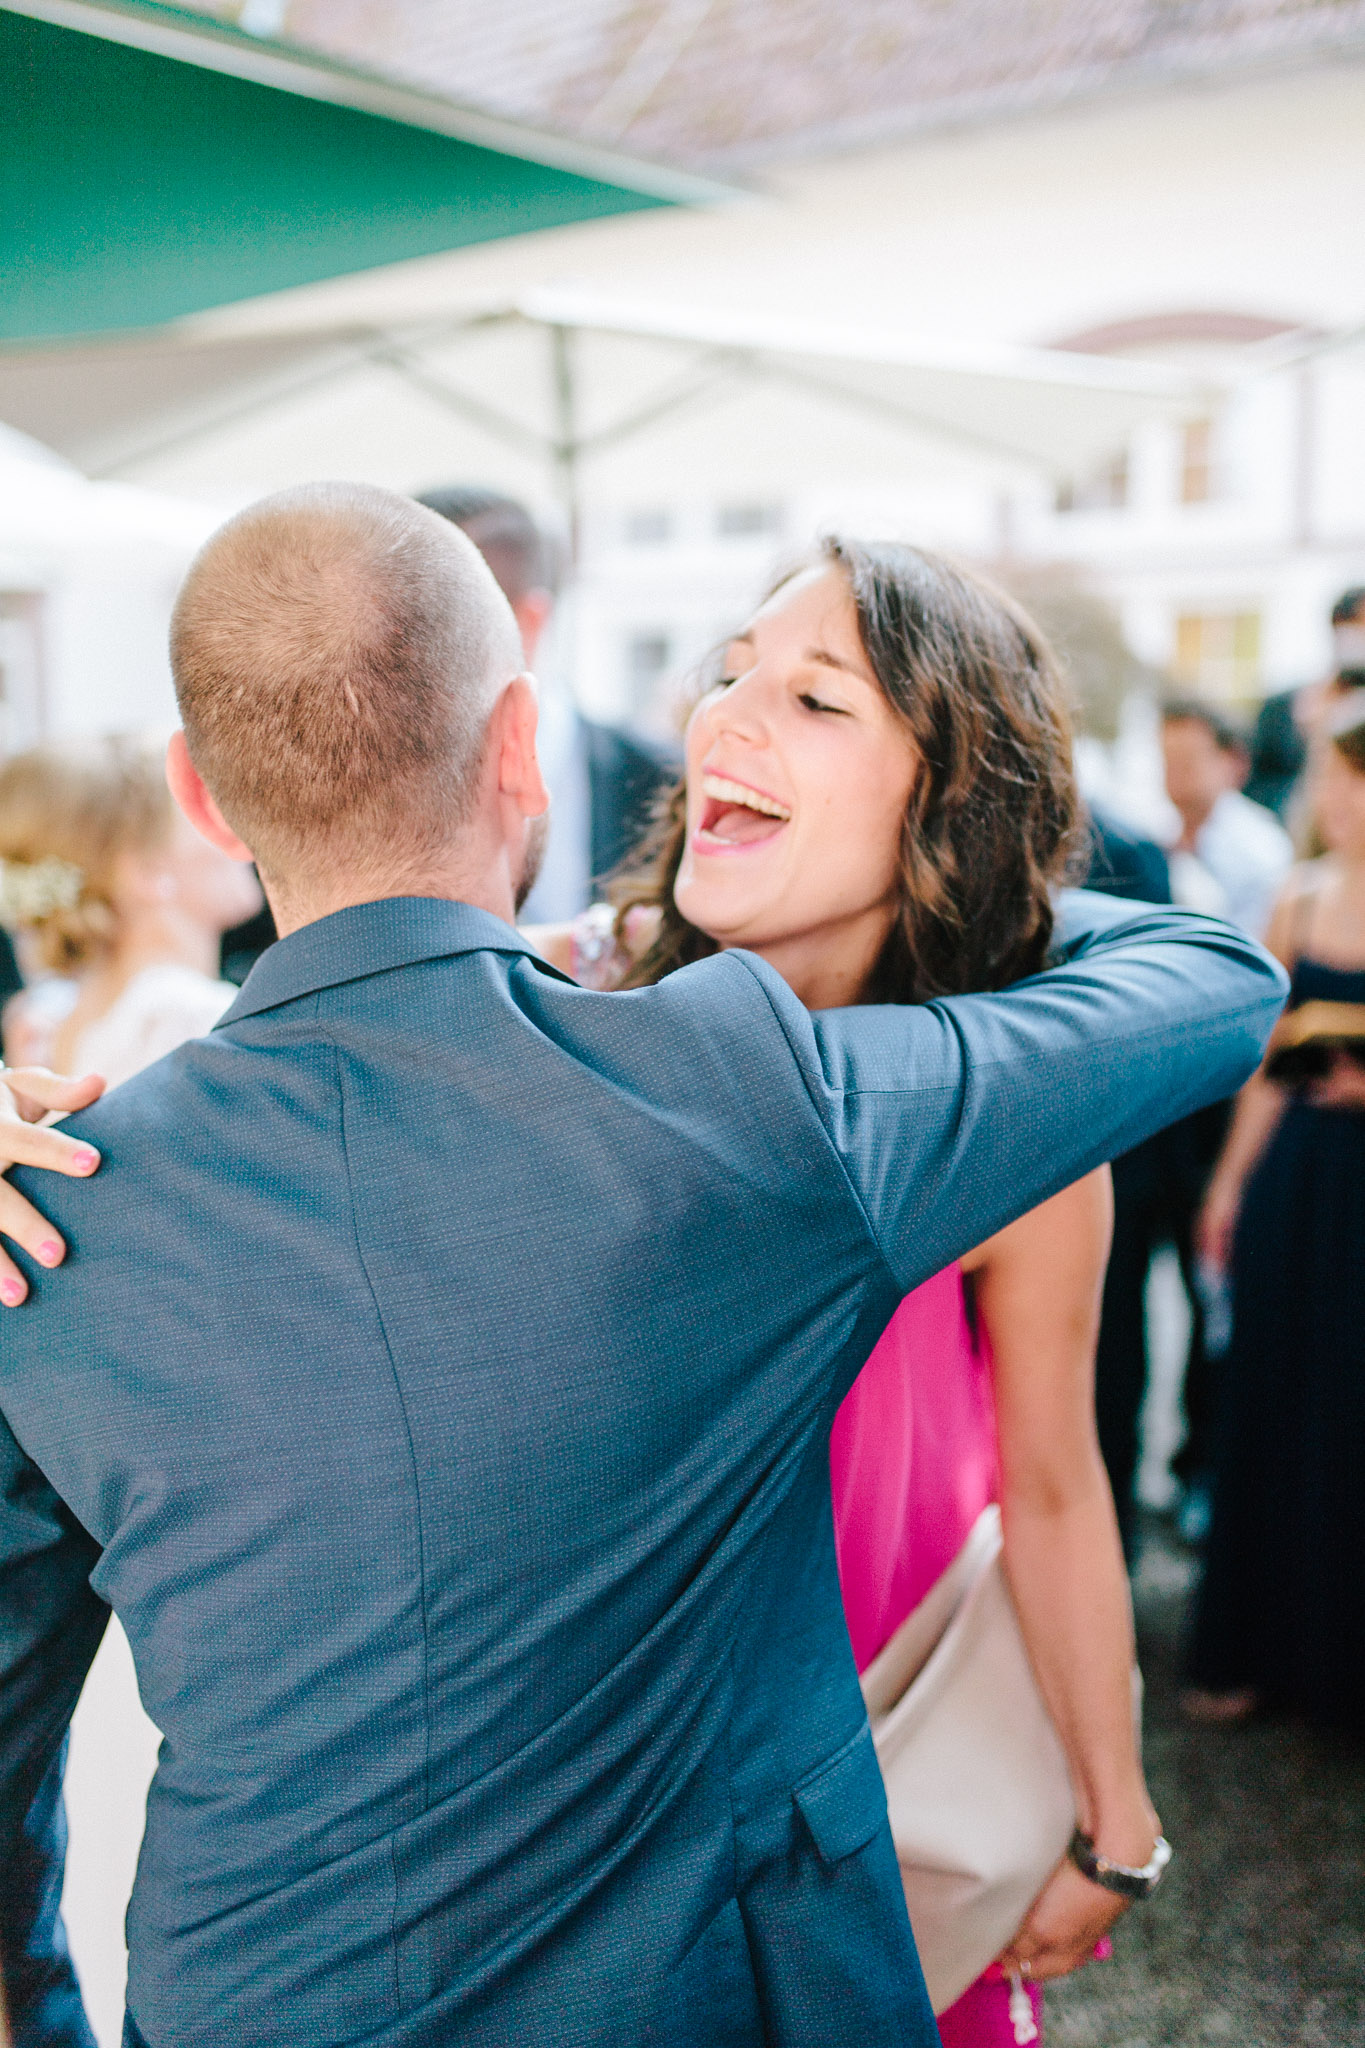 Lilienhof-Freiburg-Hochzeit-Pia-Anna-Christian-Wedding-Photography-FS-62.jpg